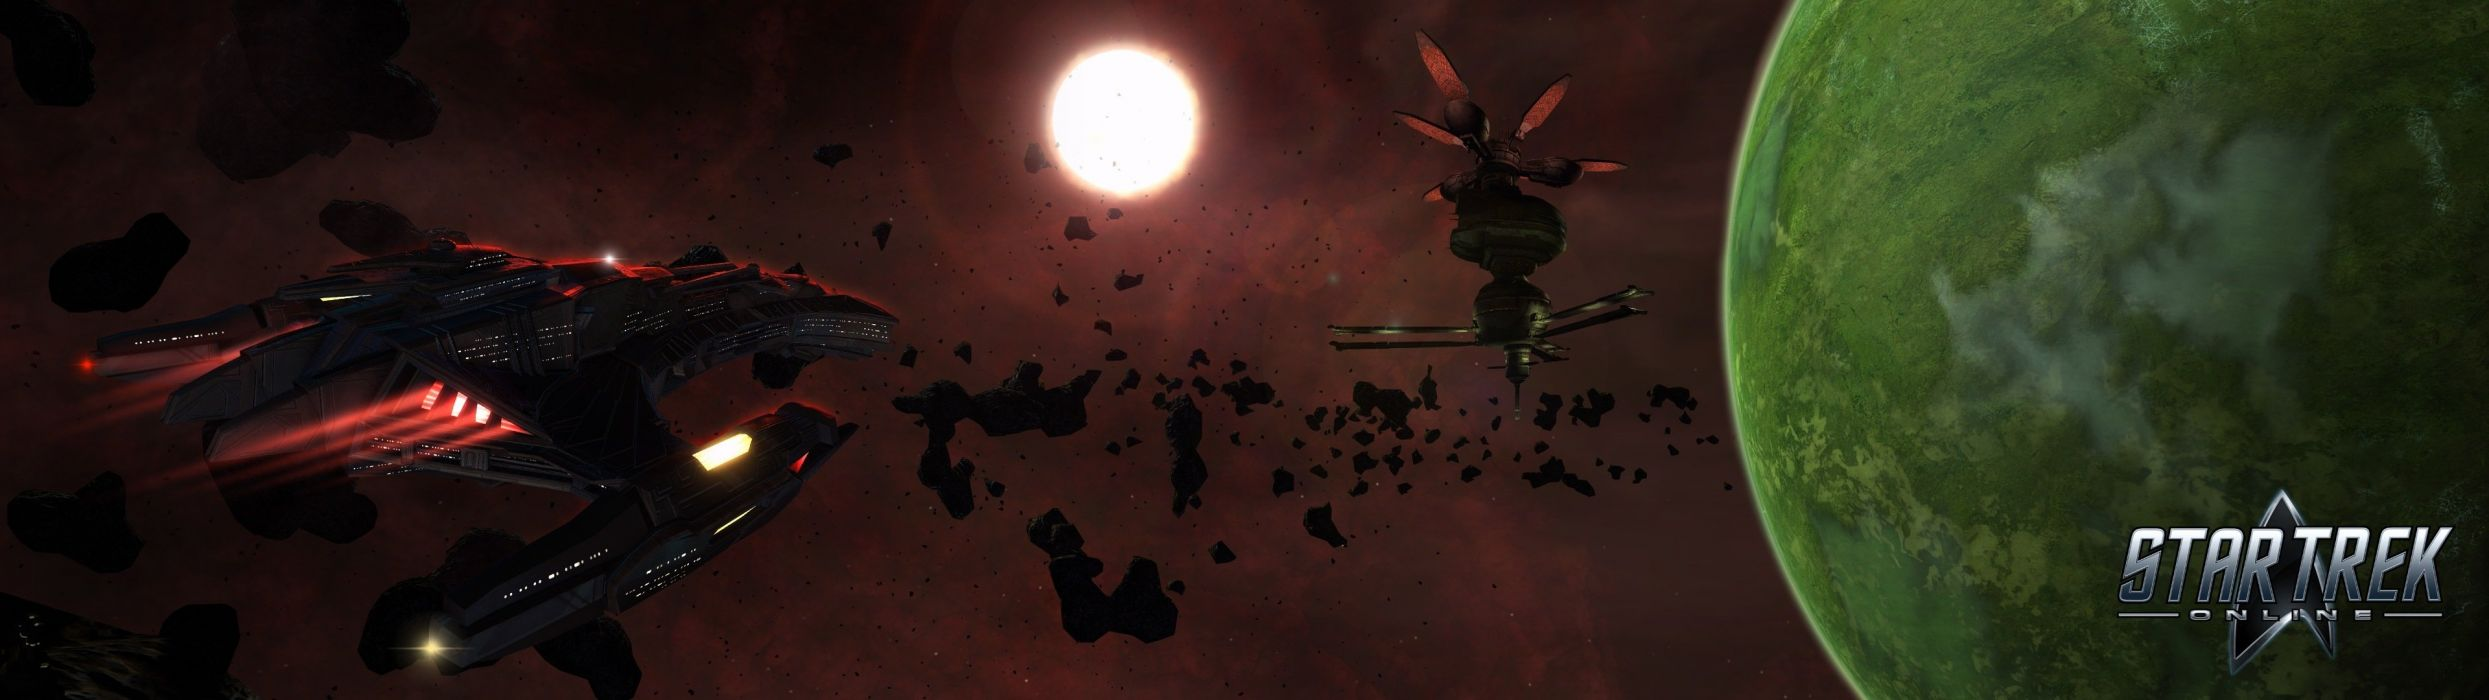 STAR TREK ONLINE game sci-fi futuristic spaceship poster planet wallpaper